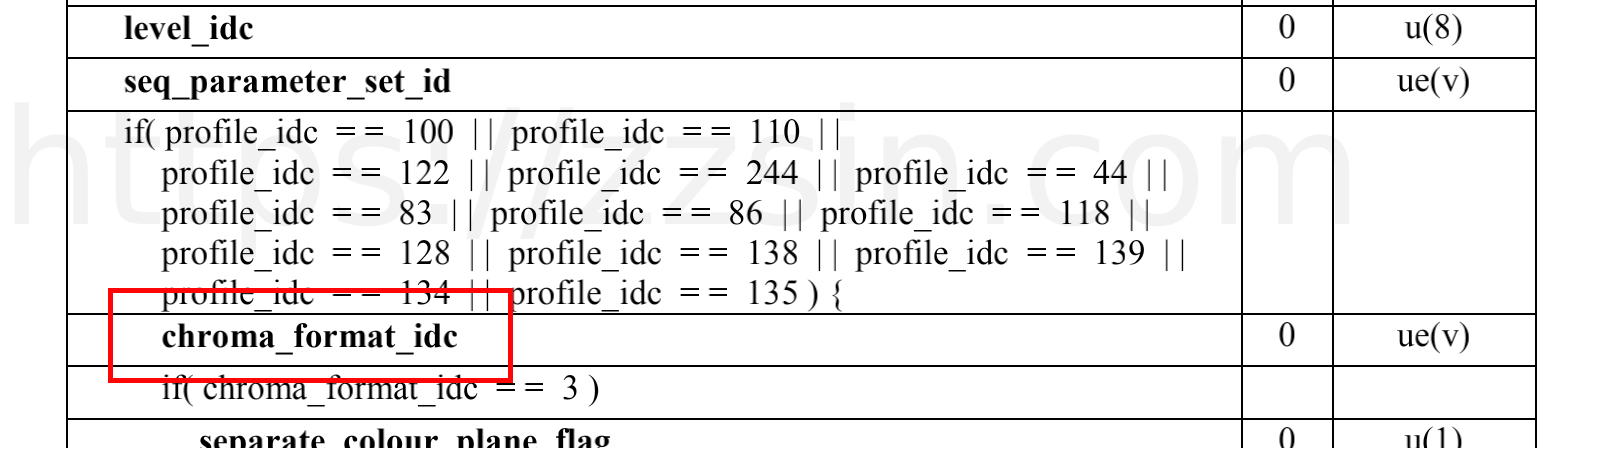 chroma_format_idc